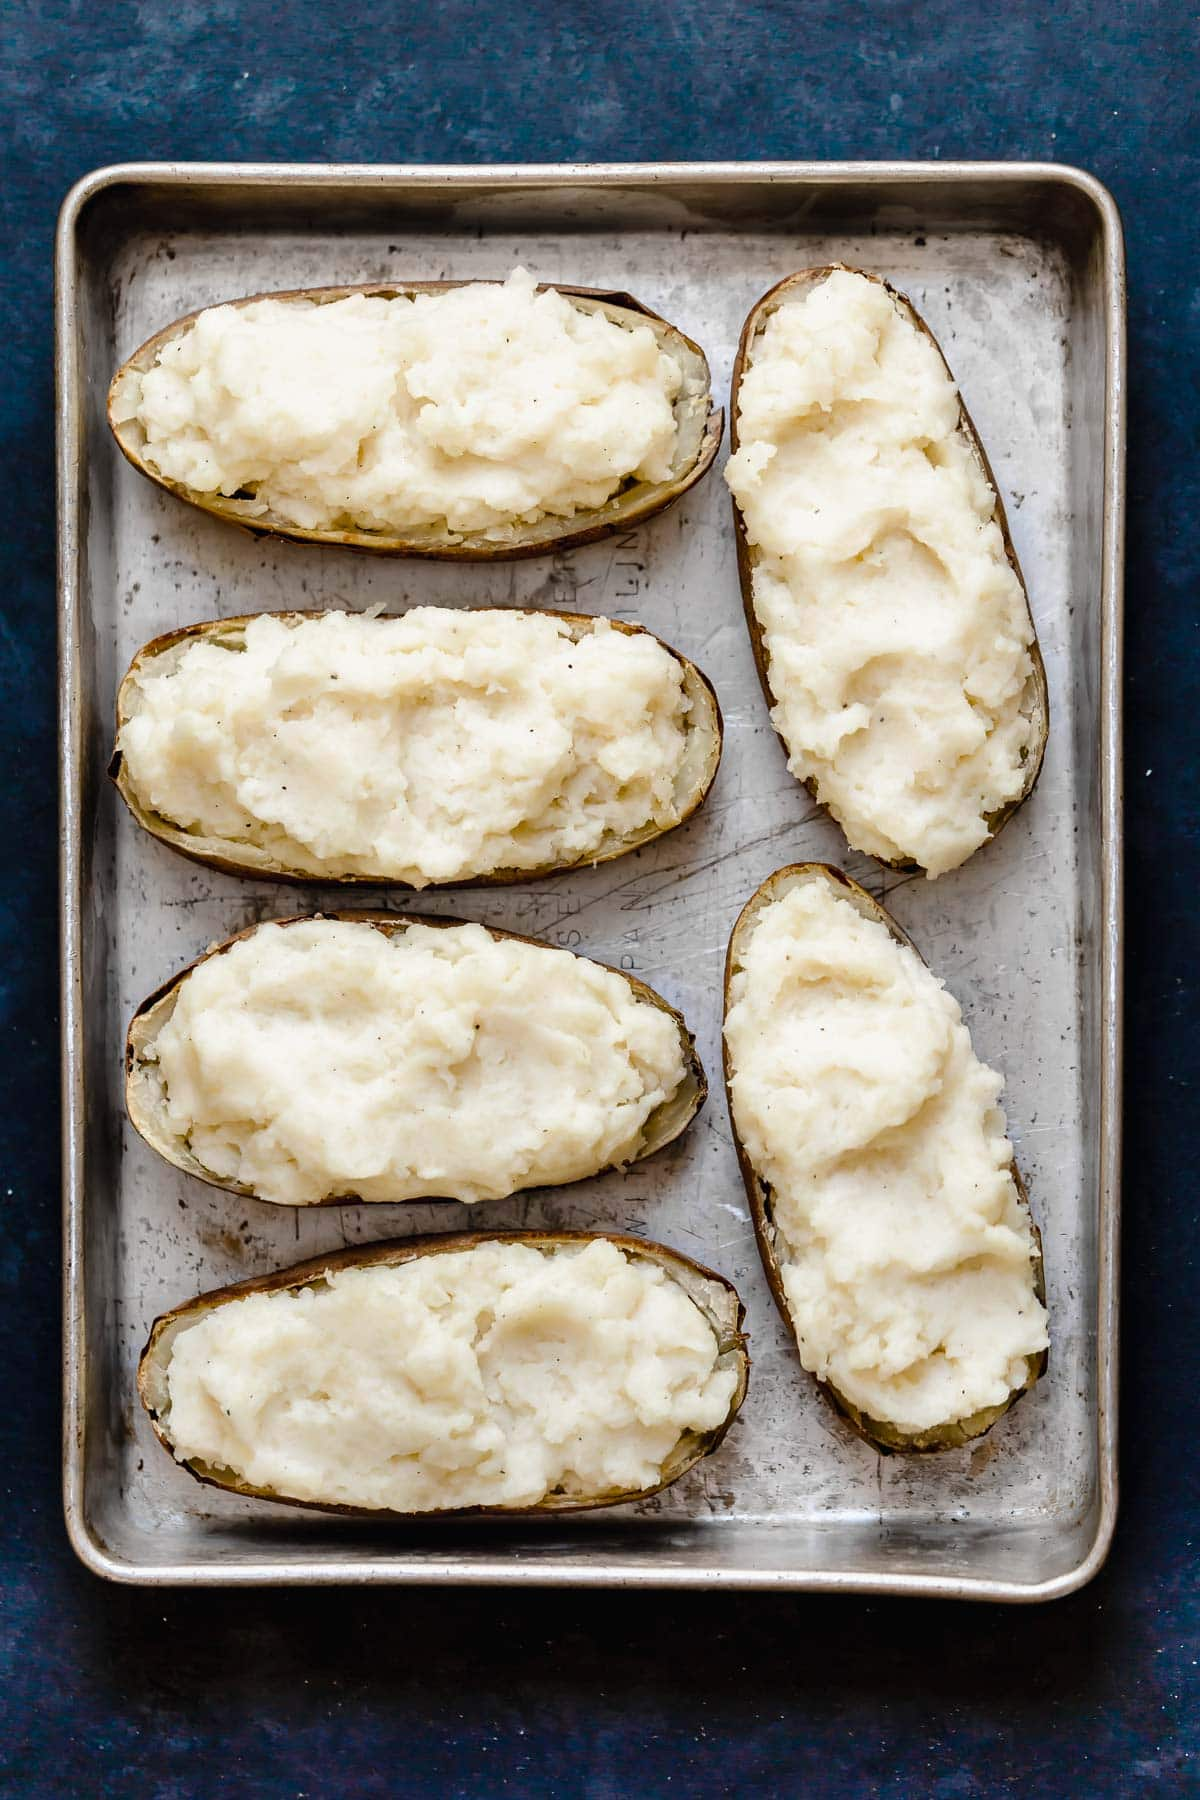 Six potato skins filled with mashed potatoes sitting on a metal baking dish.